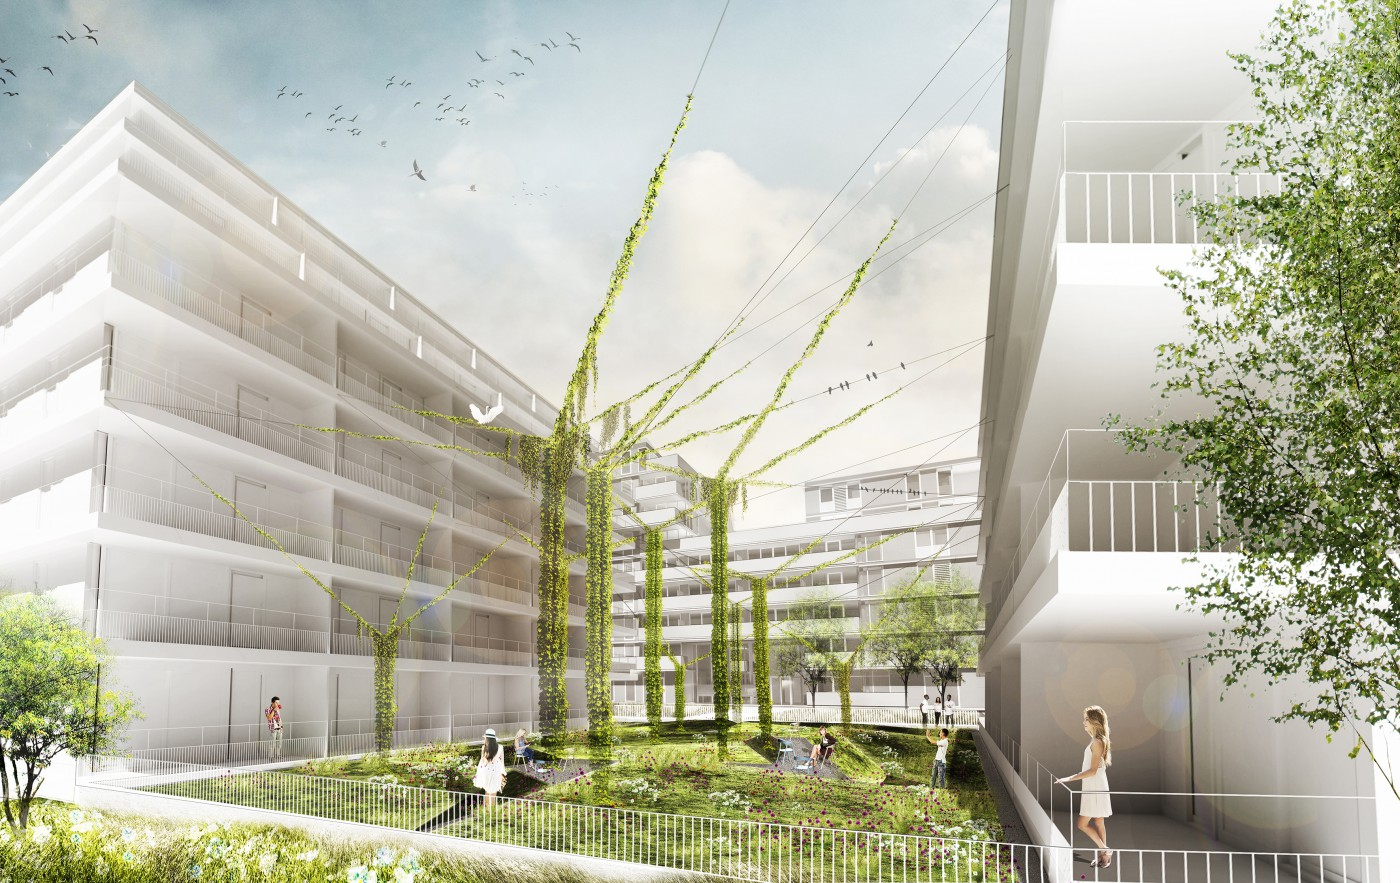 buro-sant-en-co-landschapsarchitectuur-overhoeks-amsterdam-woonomgeving-ontwerp-binnentuin-blok B-ymere-amvest